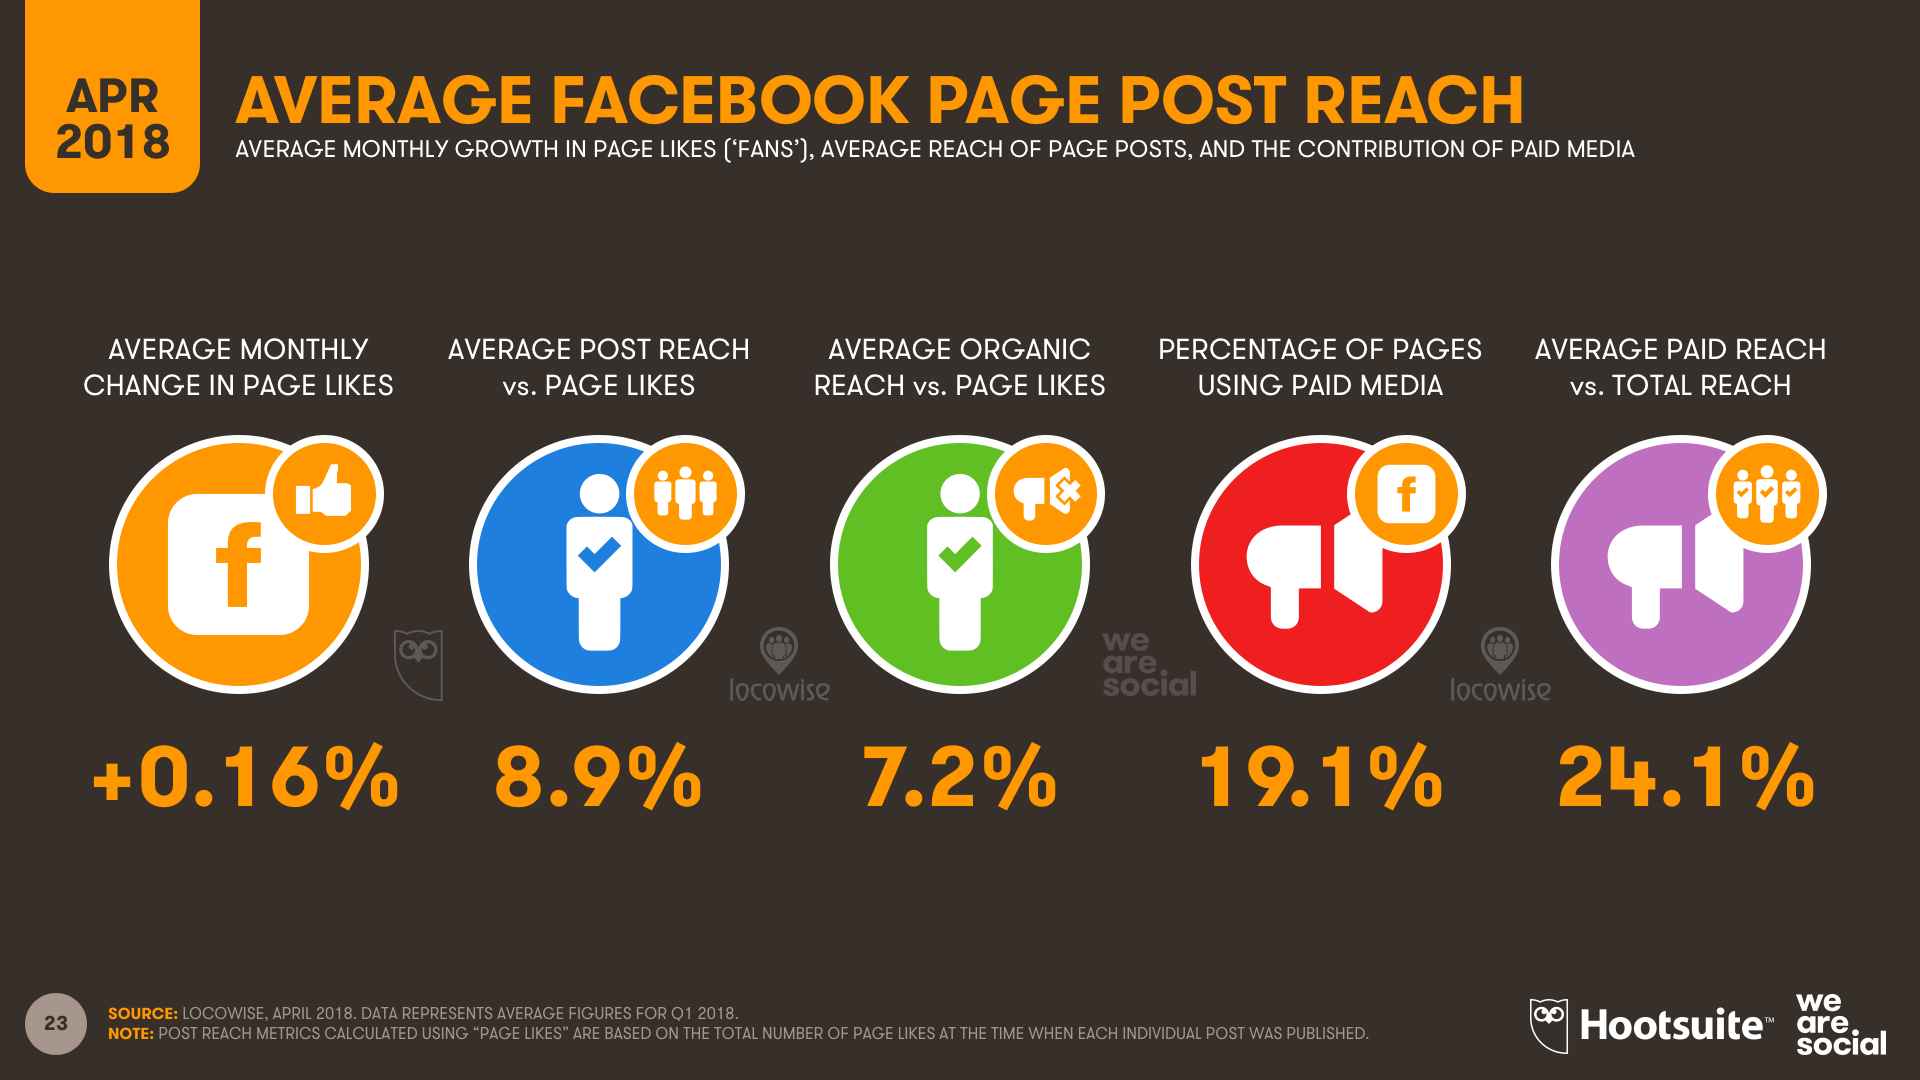 Average Facebook Page Post Reach, Q1 2018